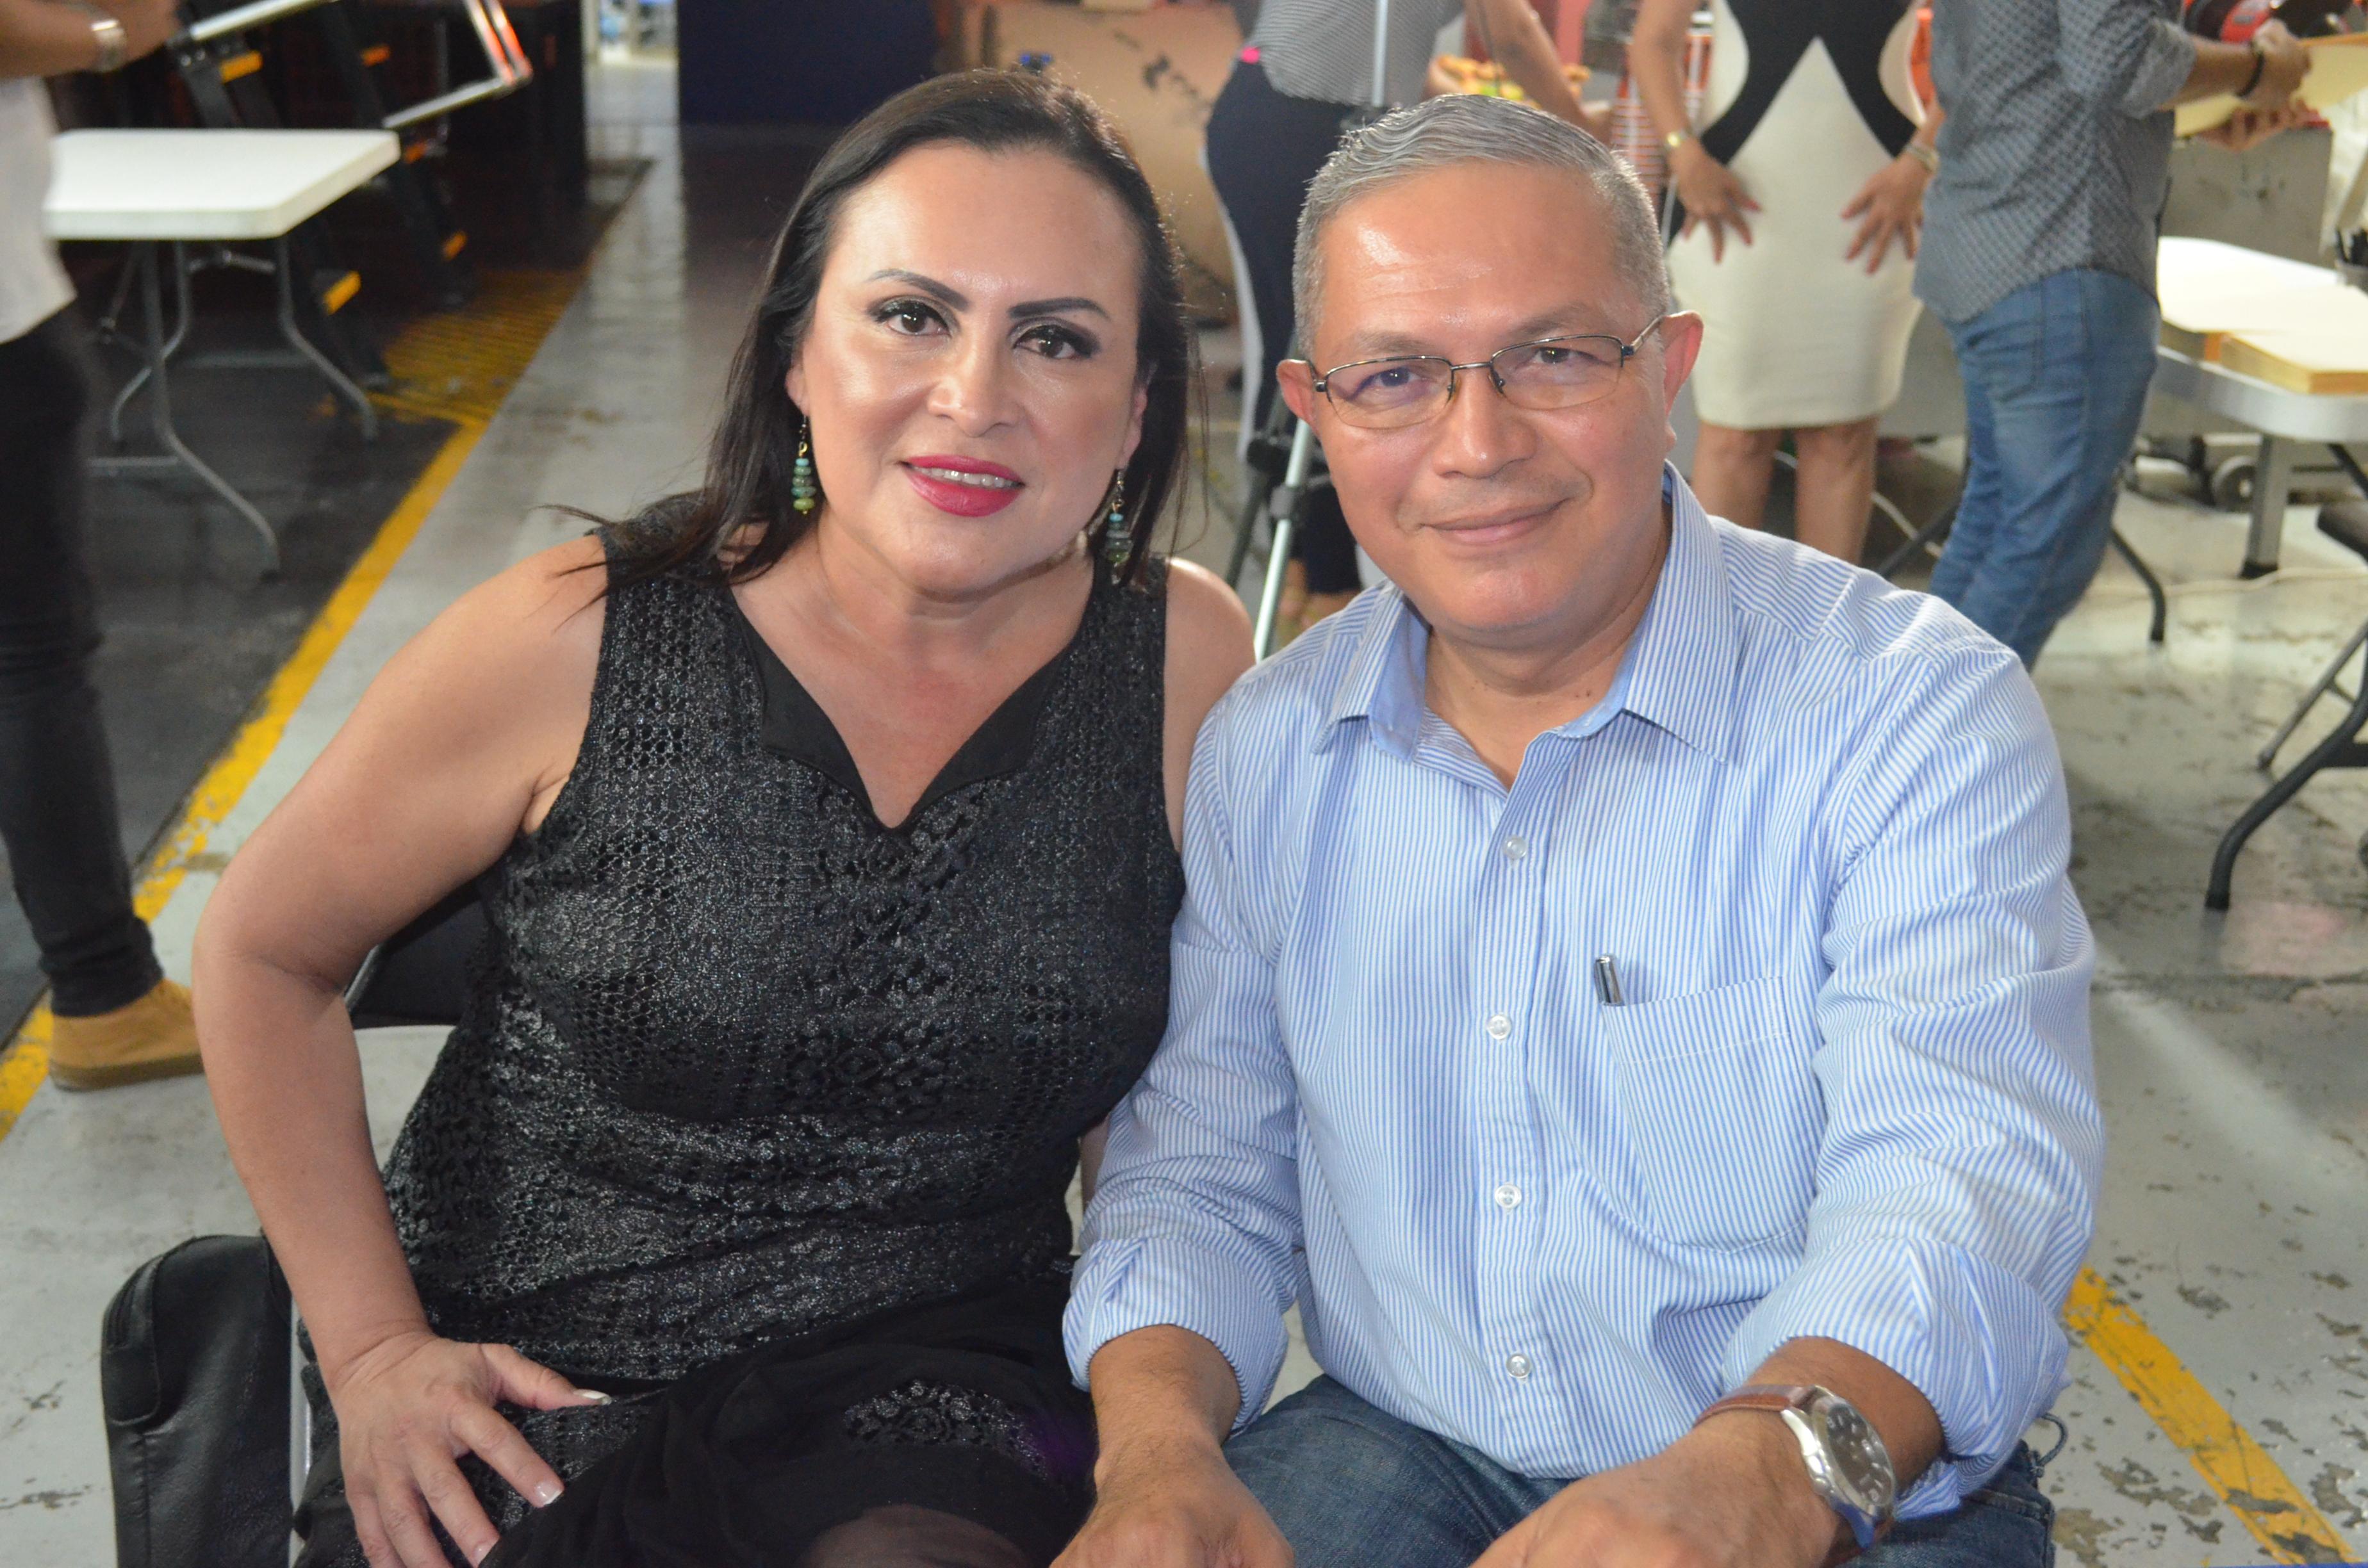 Trendy Archivos - Página 13 de 17 - Quintana Roo Hoy